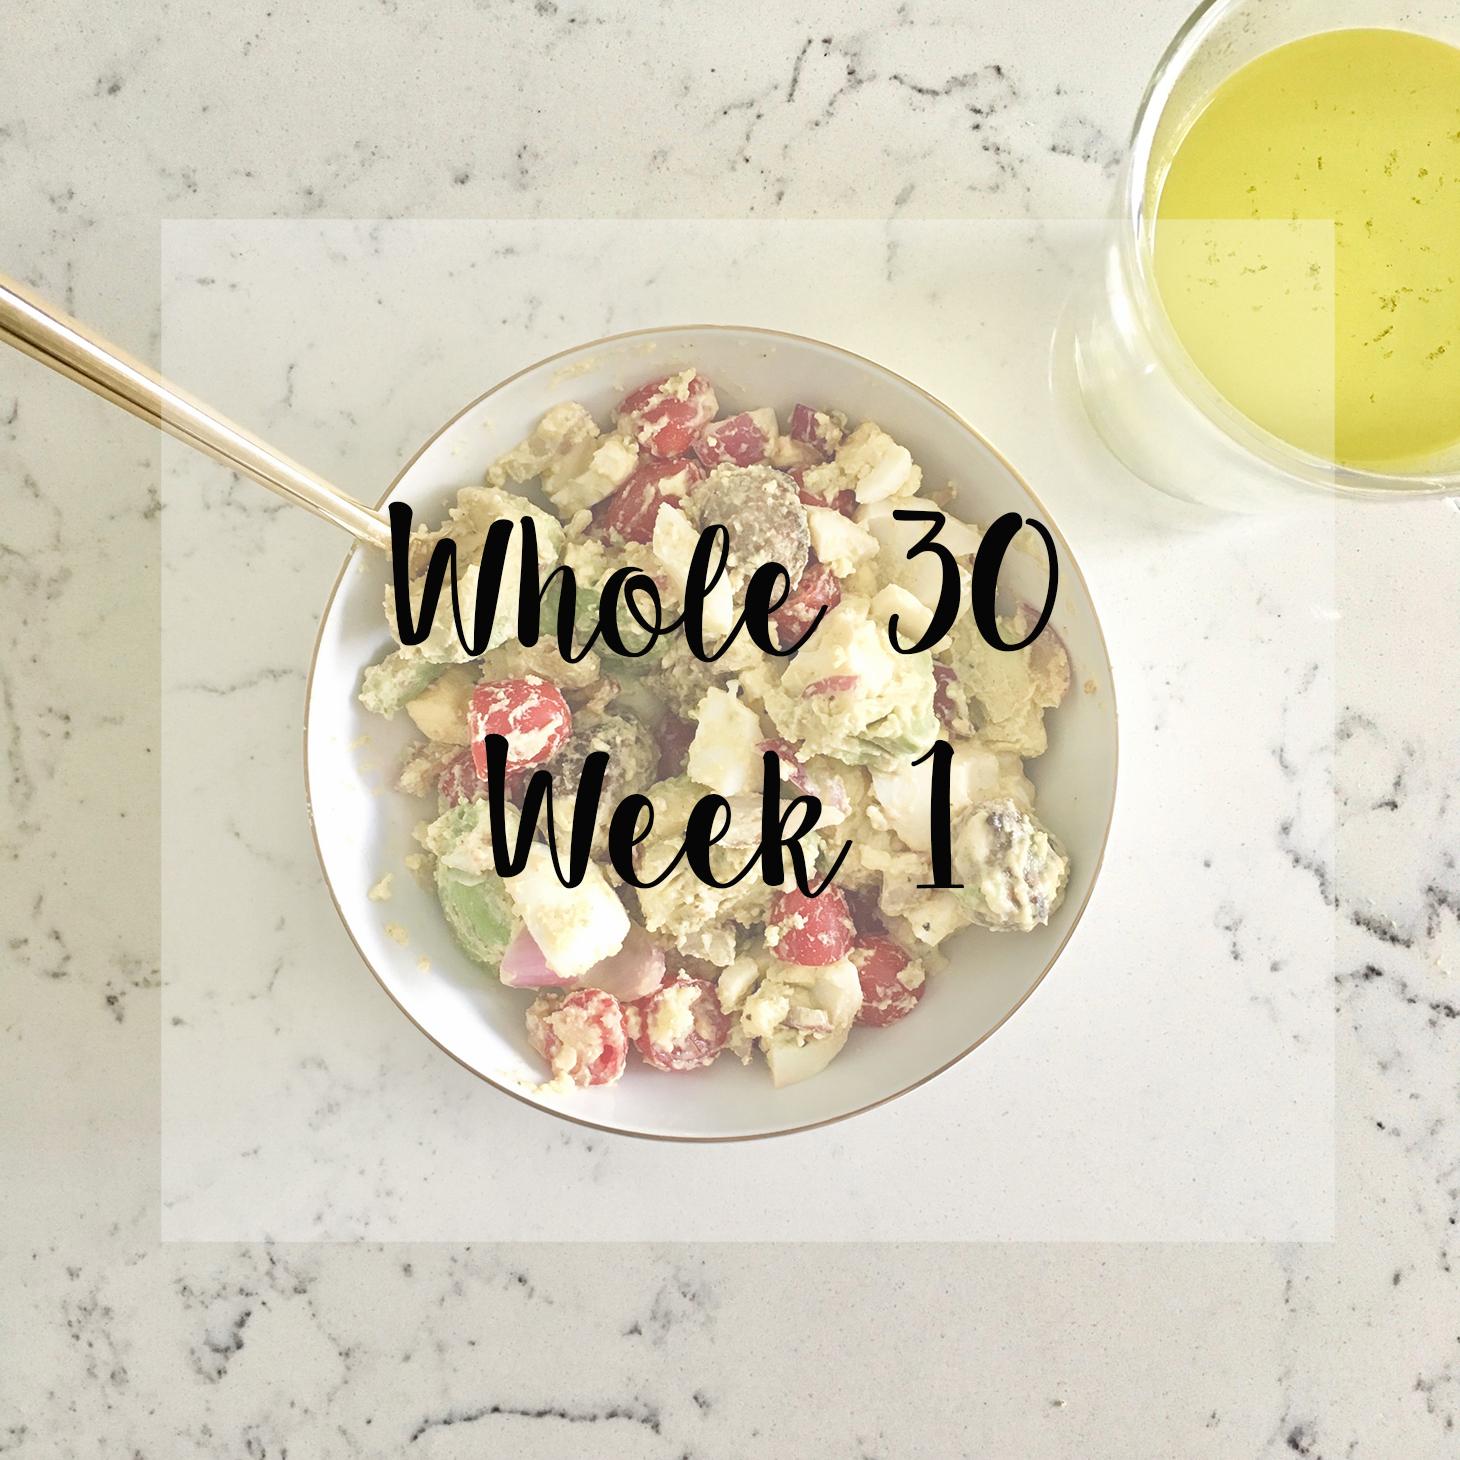 whole 30 week 1